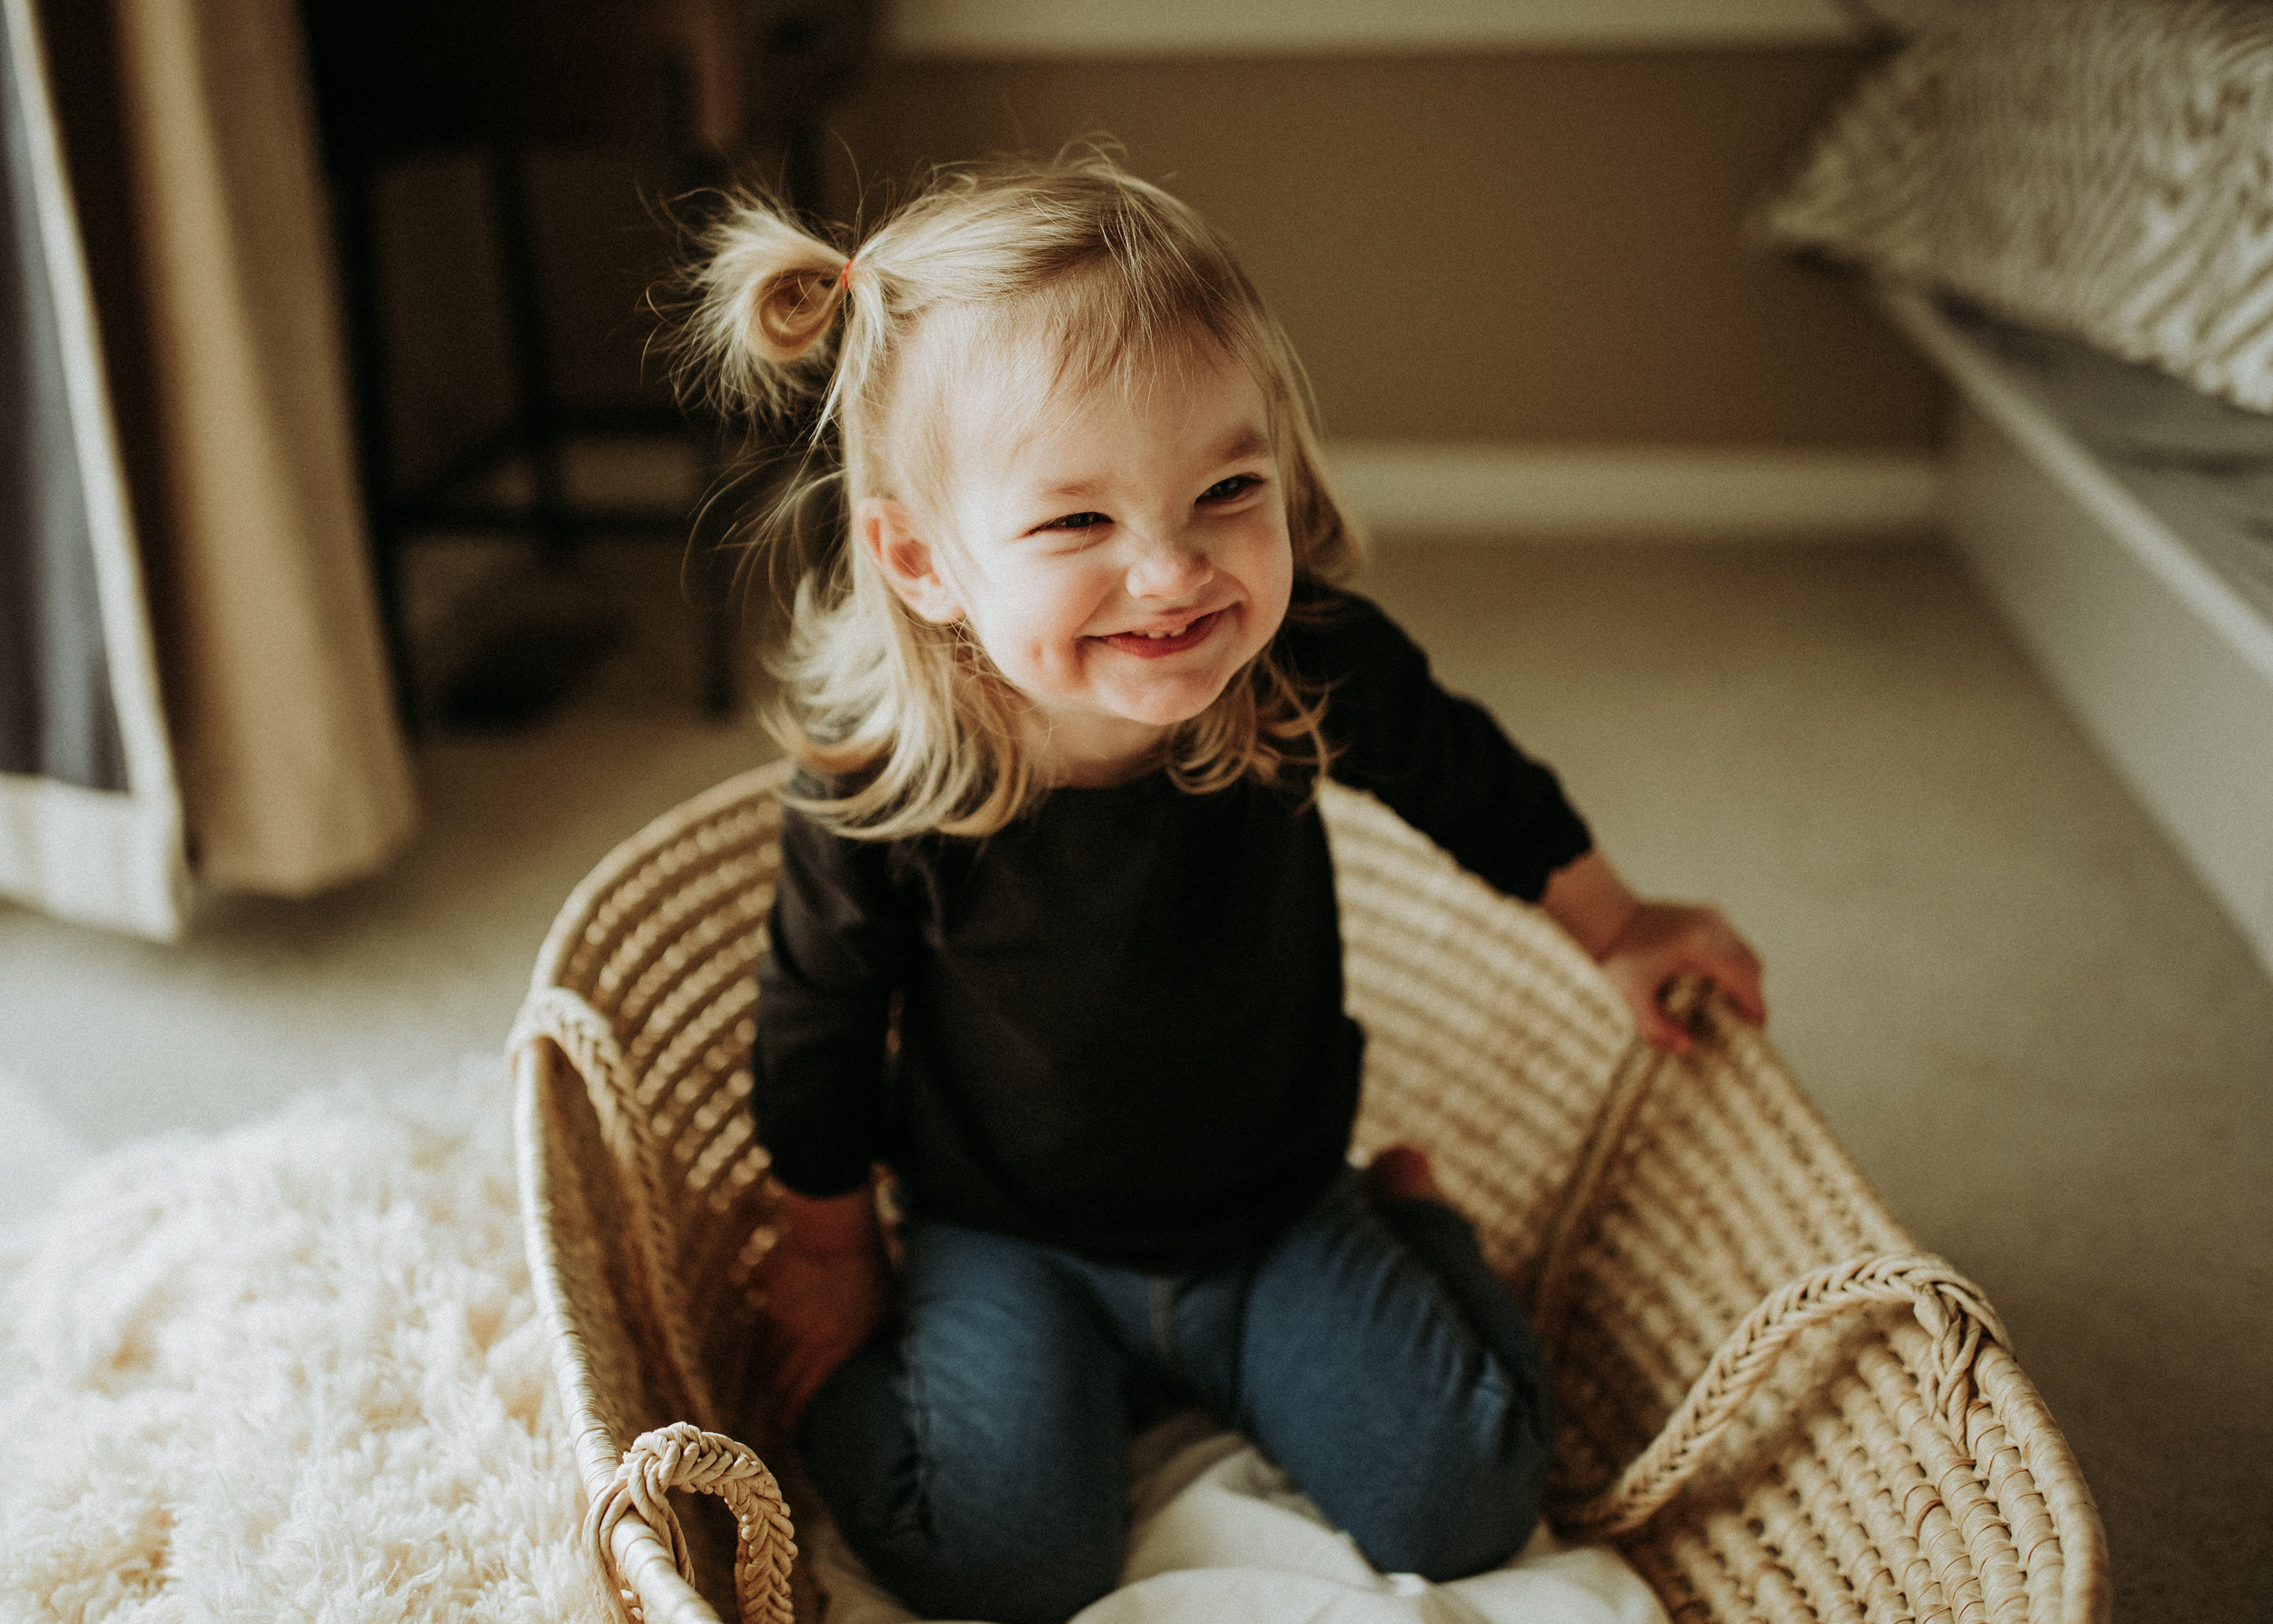 Newborn-Photographer-Bellingham-WA-Brianne-Bell-Photograpy-(Ila)-10.jpg